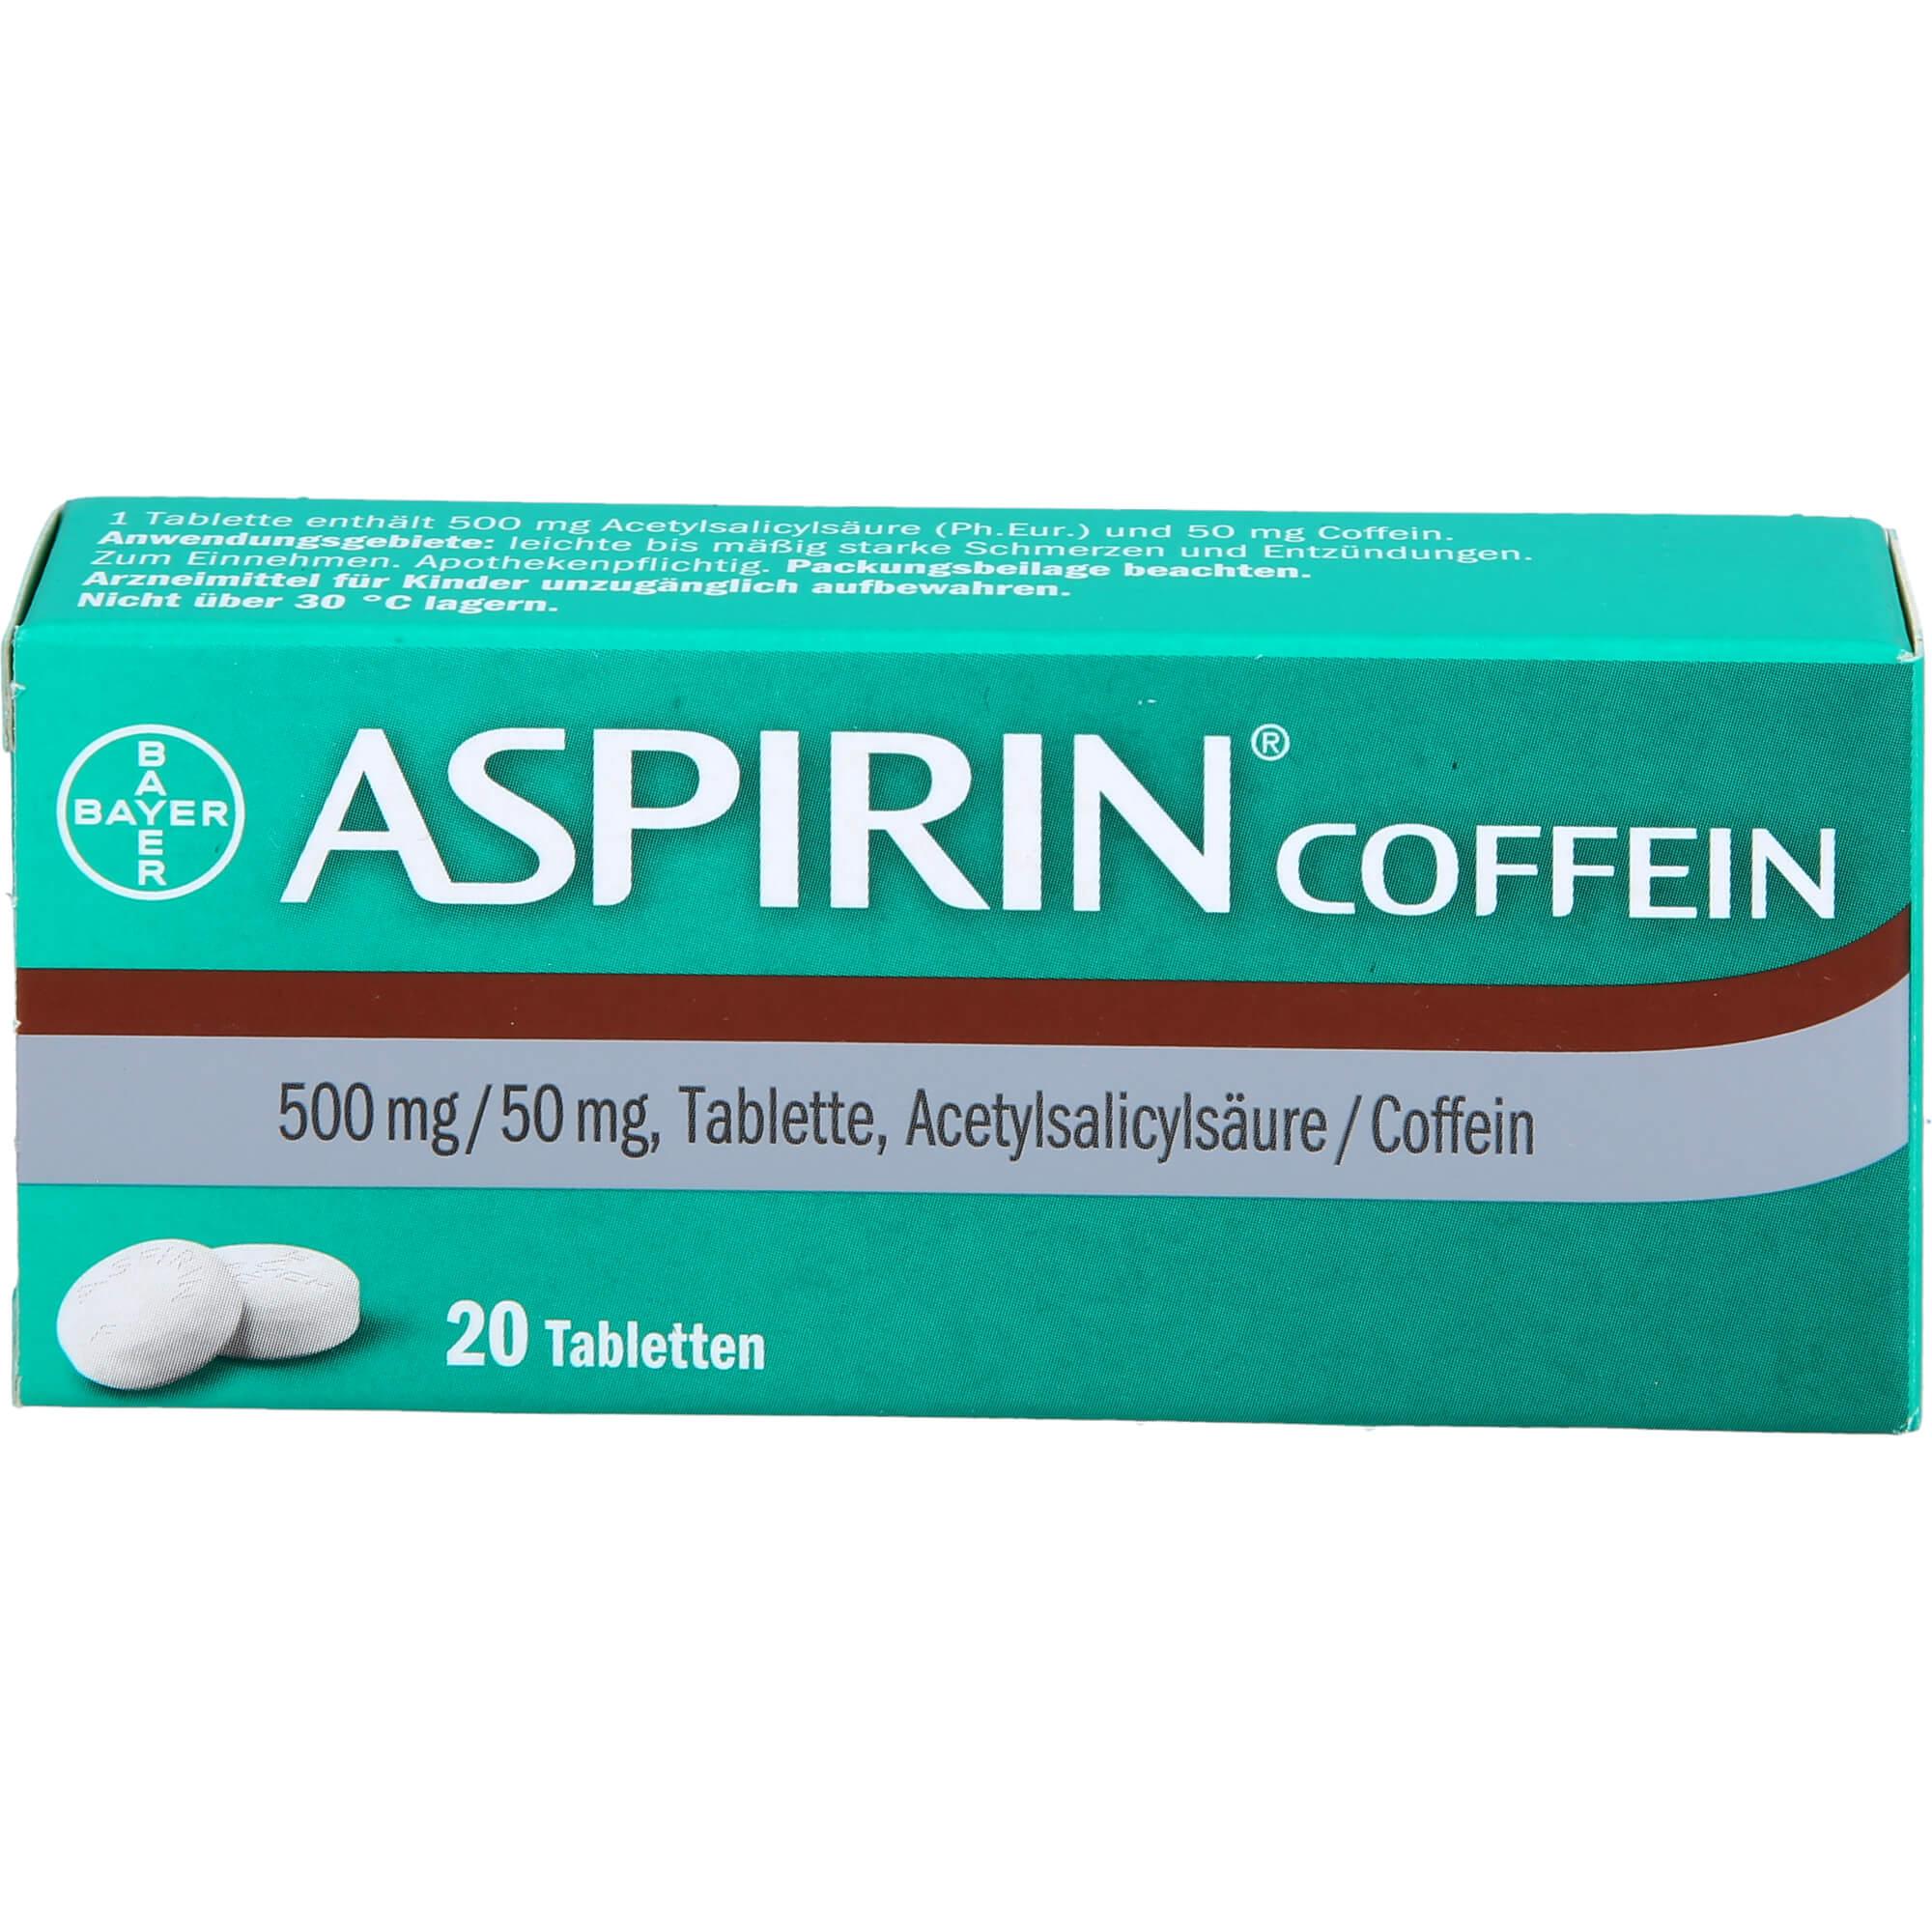 ASPIRIN Coffein Tabletten